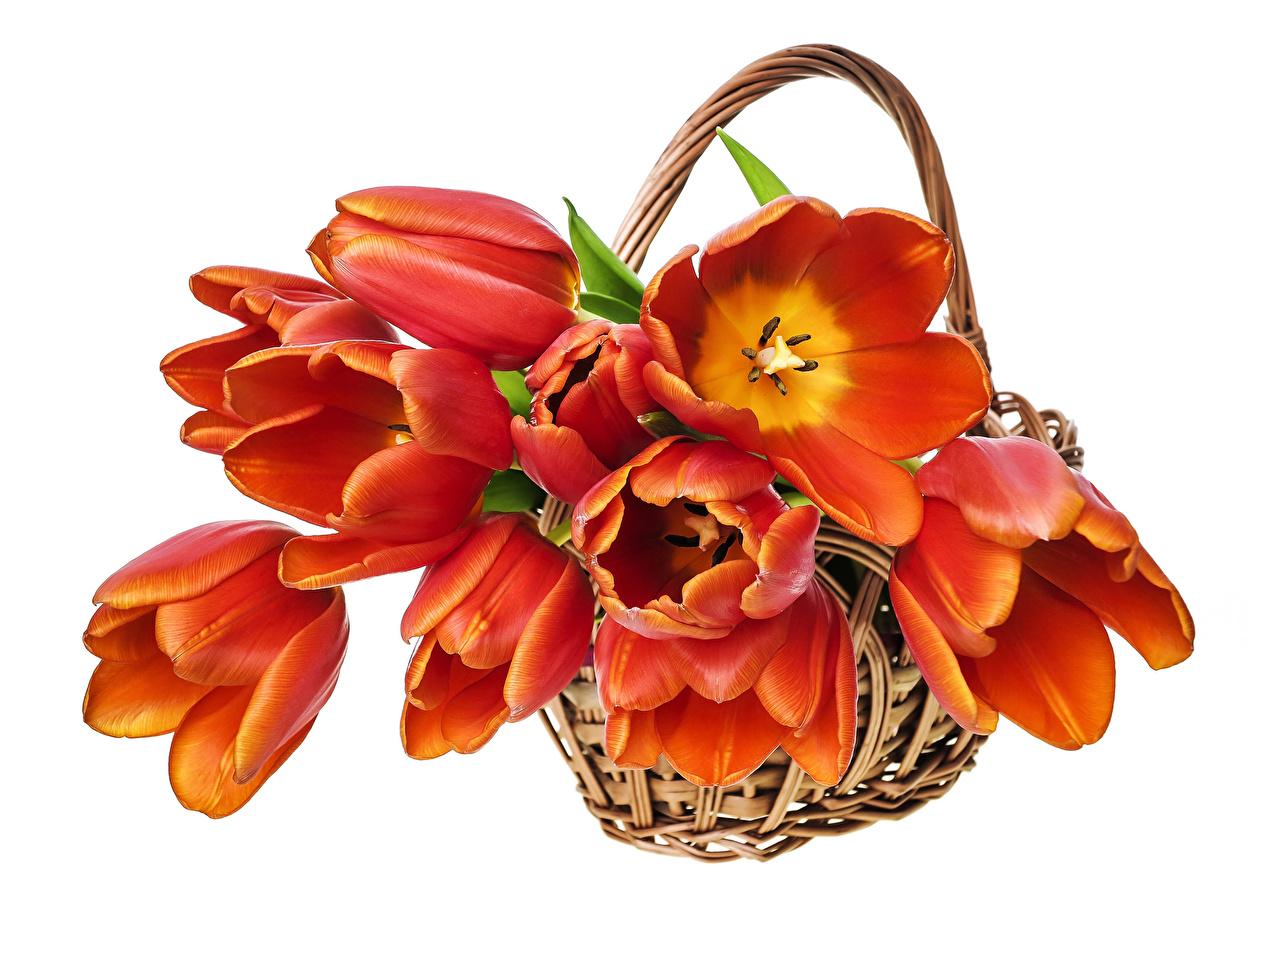 Картинка тюльпан Оранжевый цветок Корзинка Много Тюльпаны оранжевая оранжевые оранжевых Цветы Корзина корзины